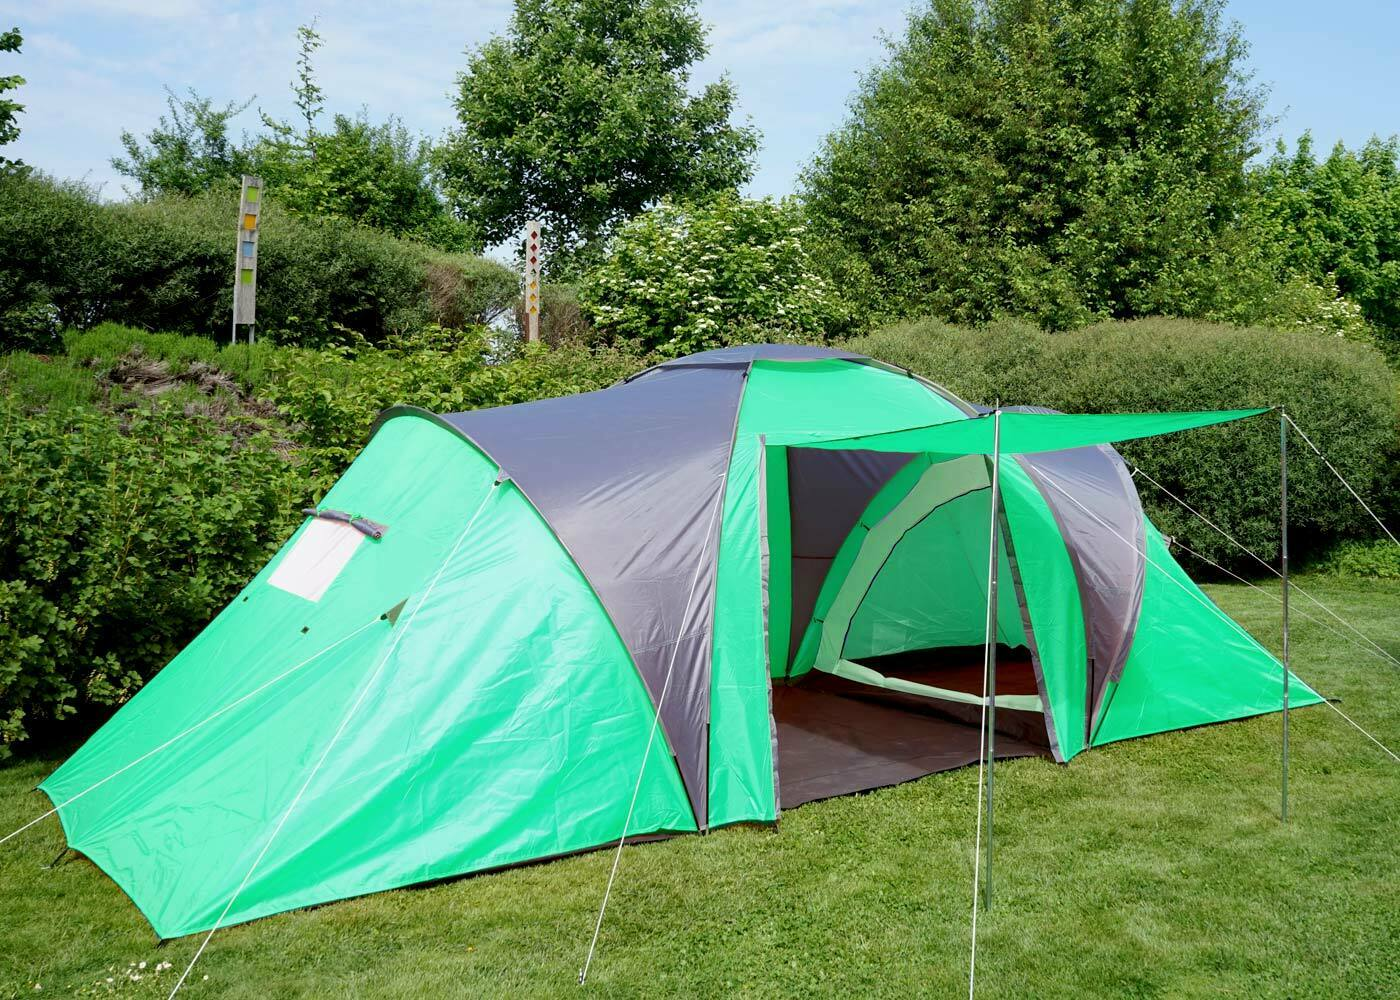 Tienda de camping Loksa, 6-hombre kuppelzelt igluzelt Festival-carpa, 6 personas verde